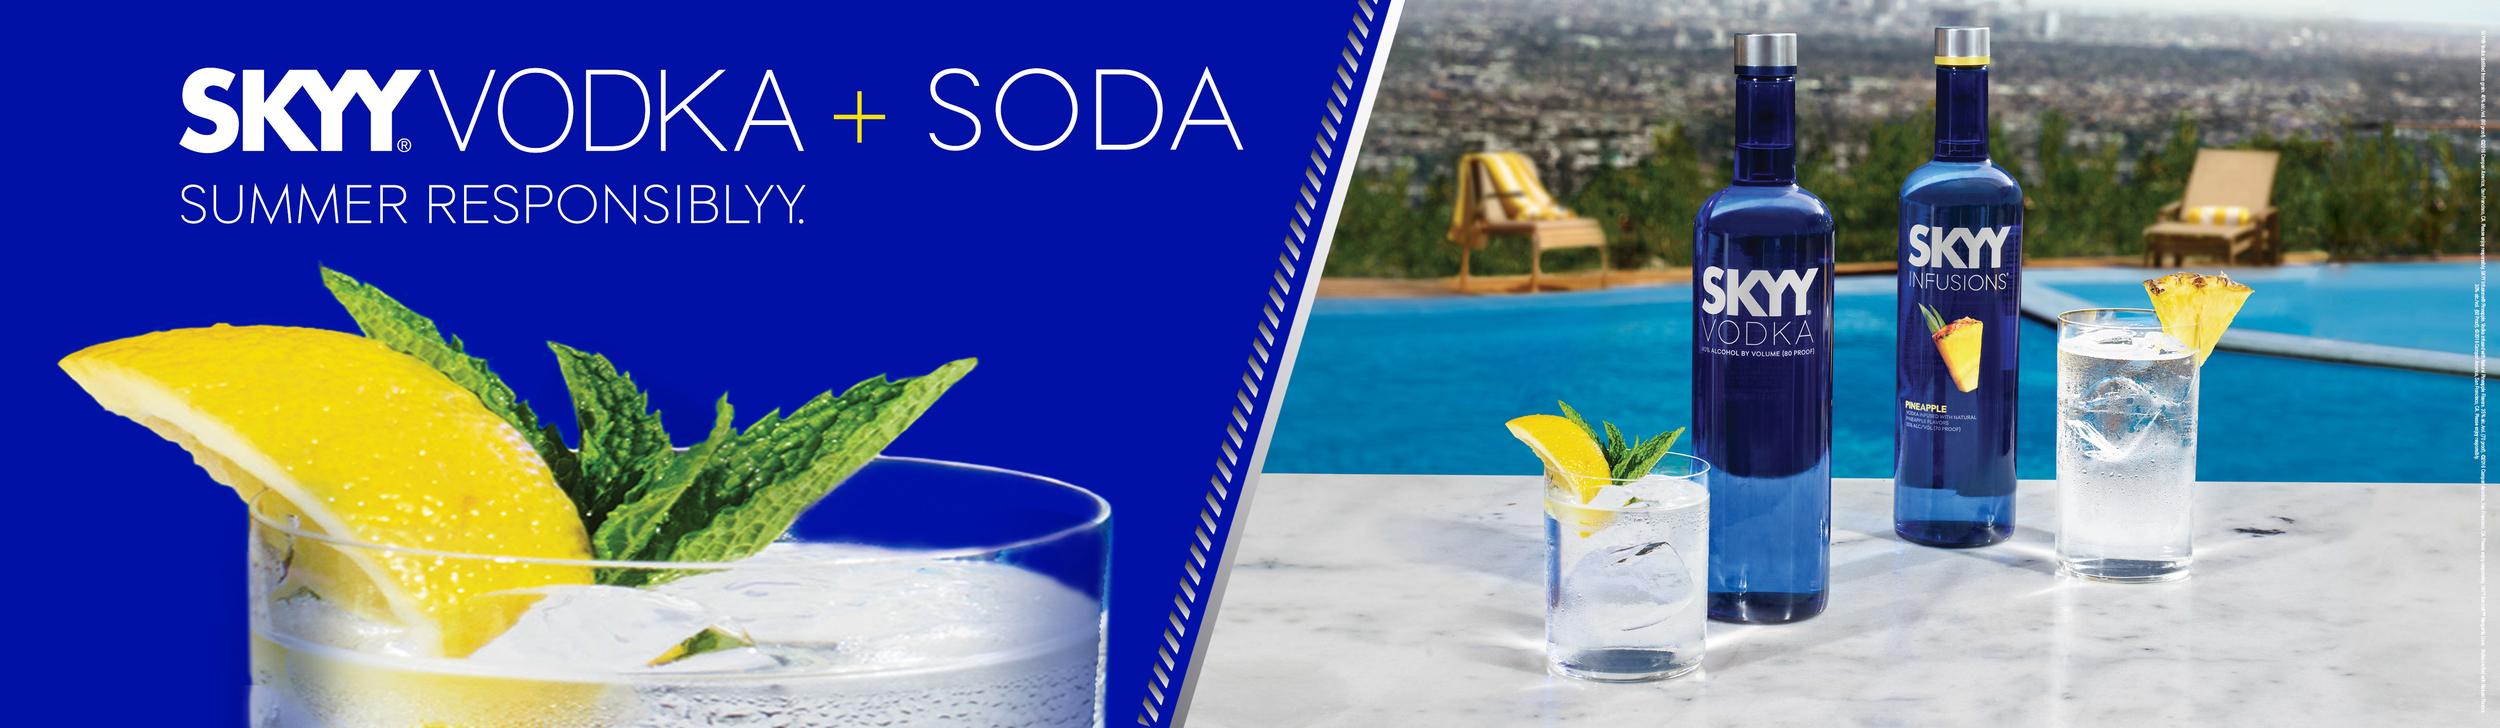 SKYY Vodka - Summer Print Campaign